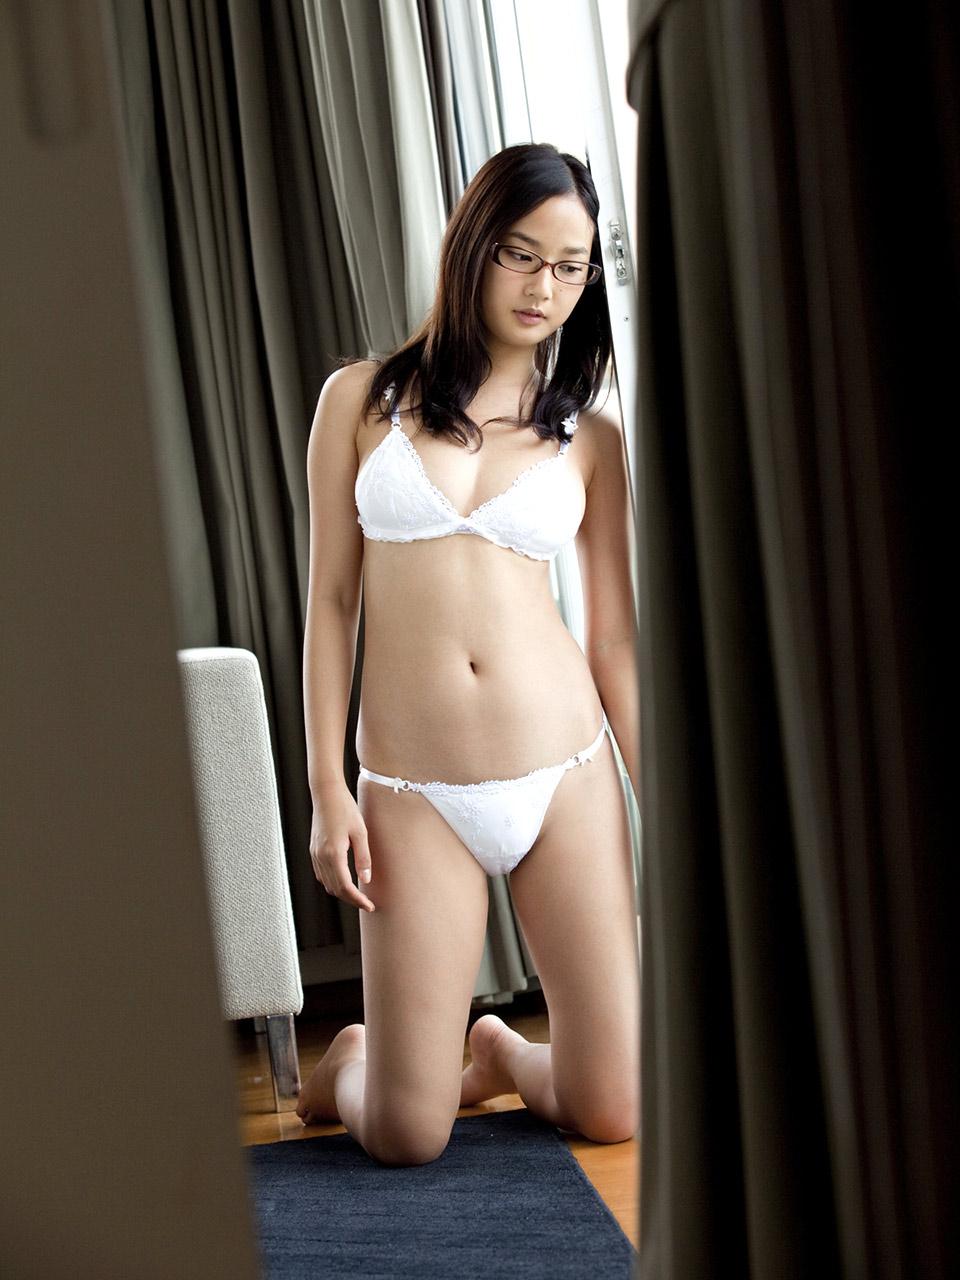 Uncensored japanese ayumu sena blowjob interview subtitled - 3 part 3